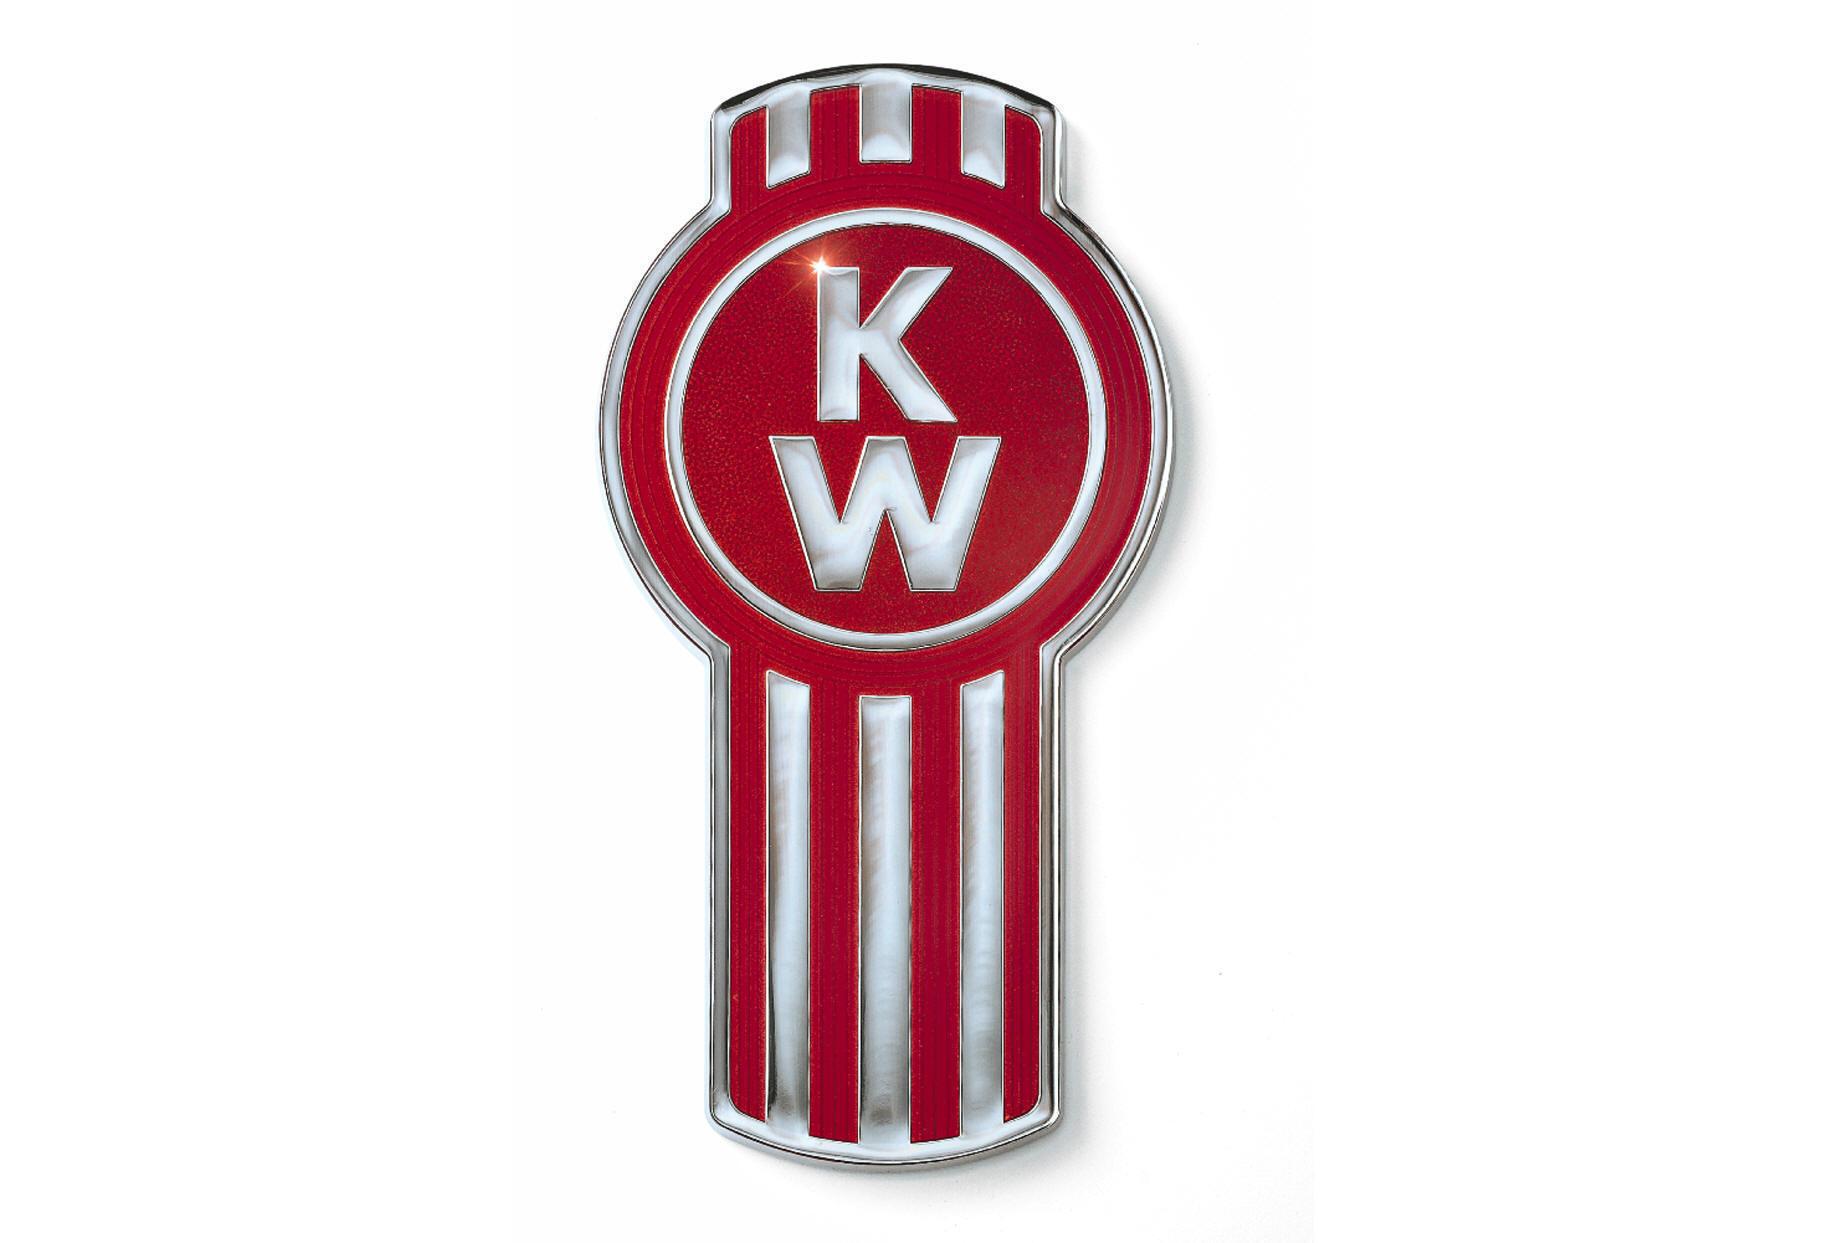 Kenworth Logo Wallpaper